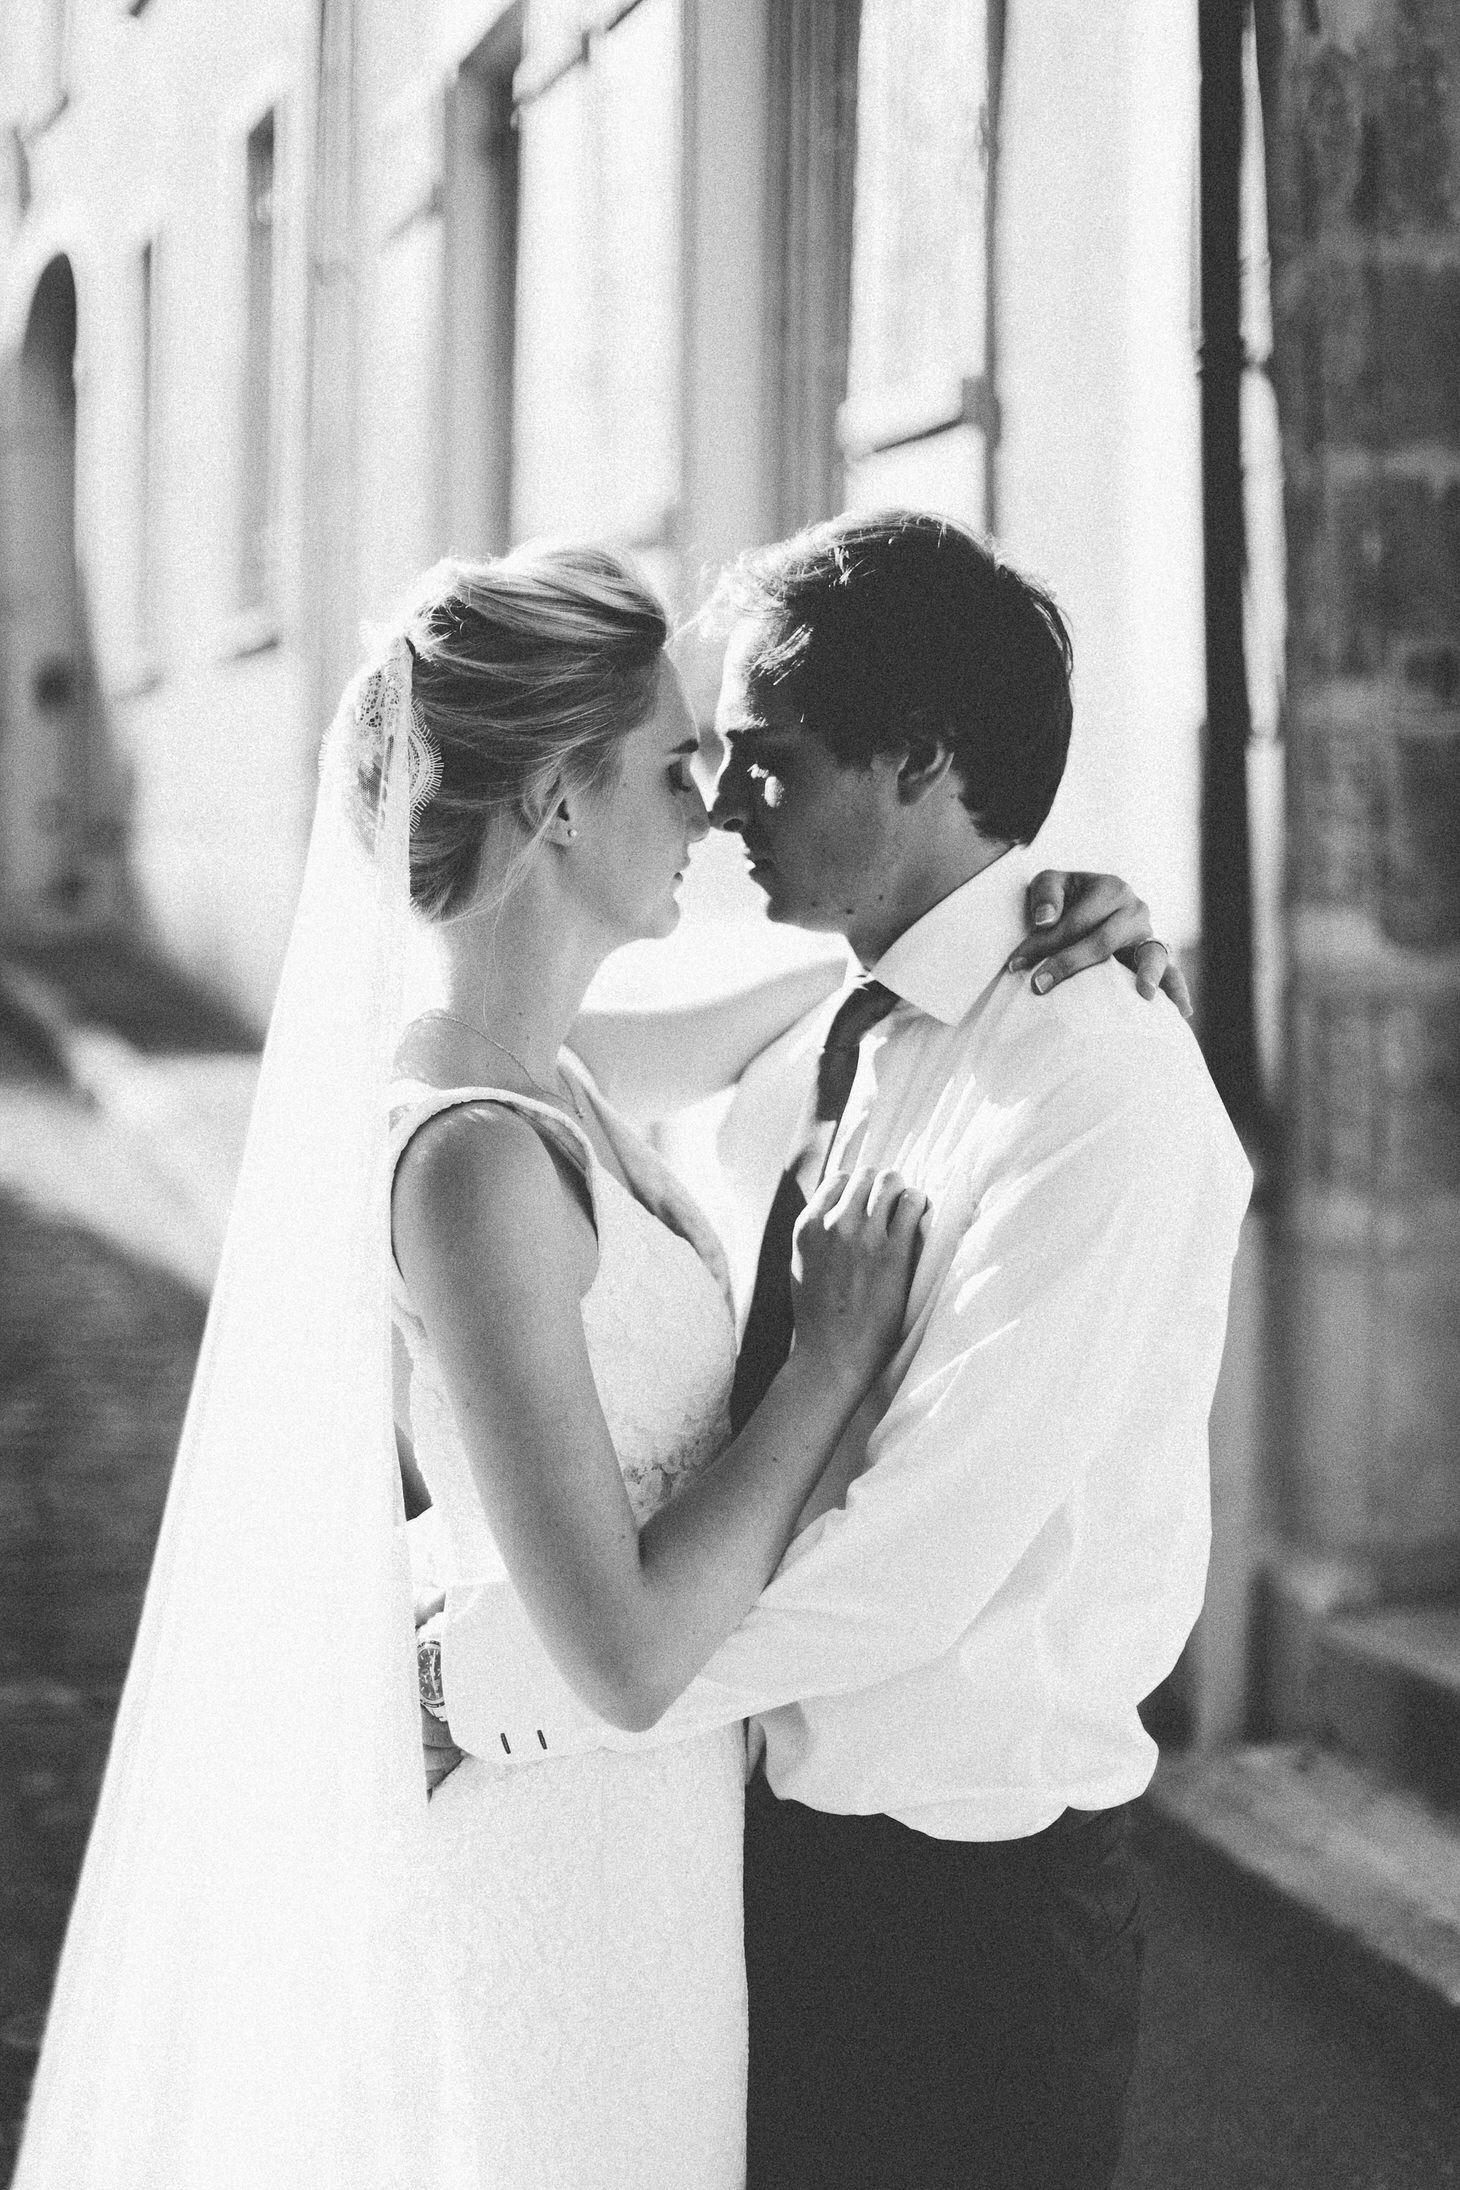 photographe-mariage-paris-montfort-l-amaury-054